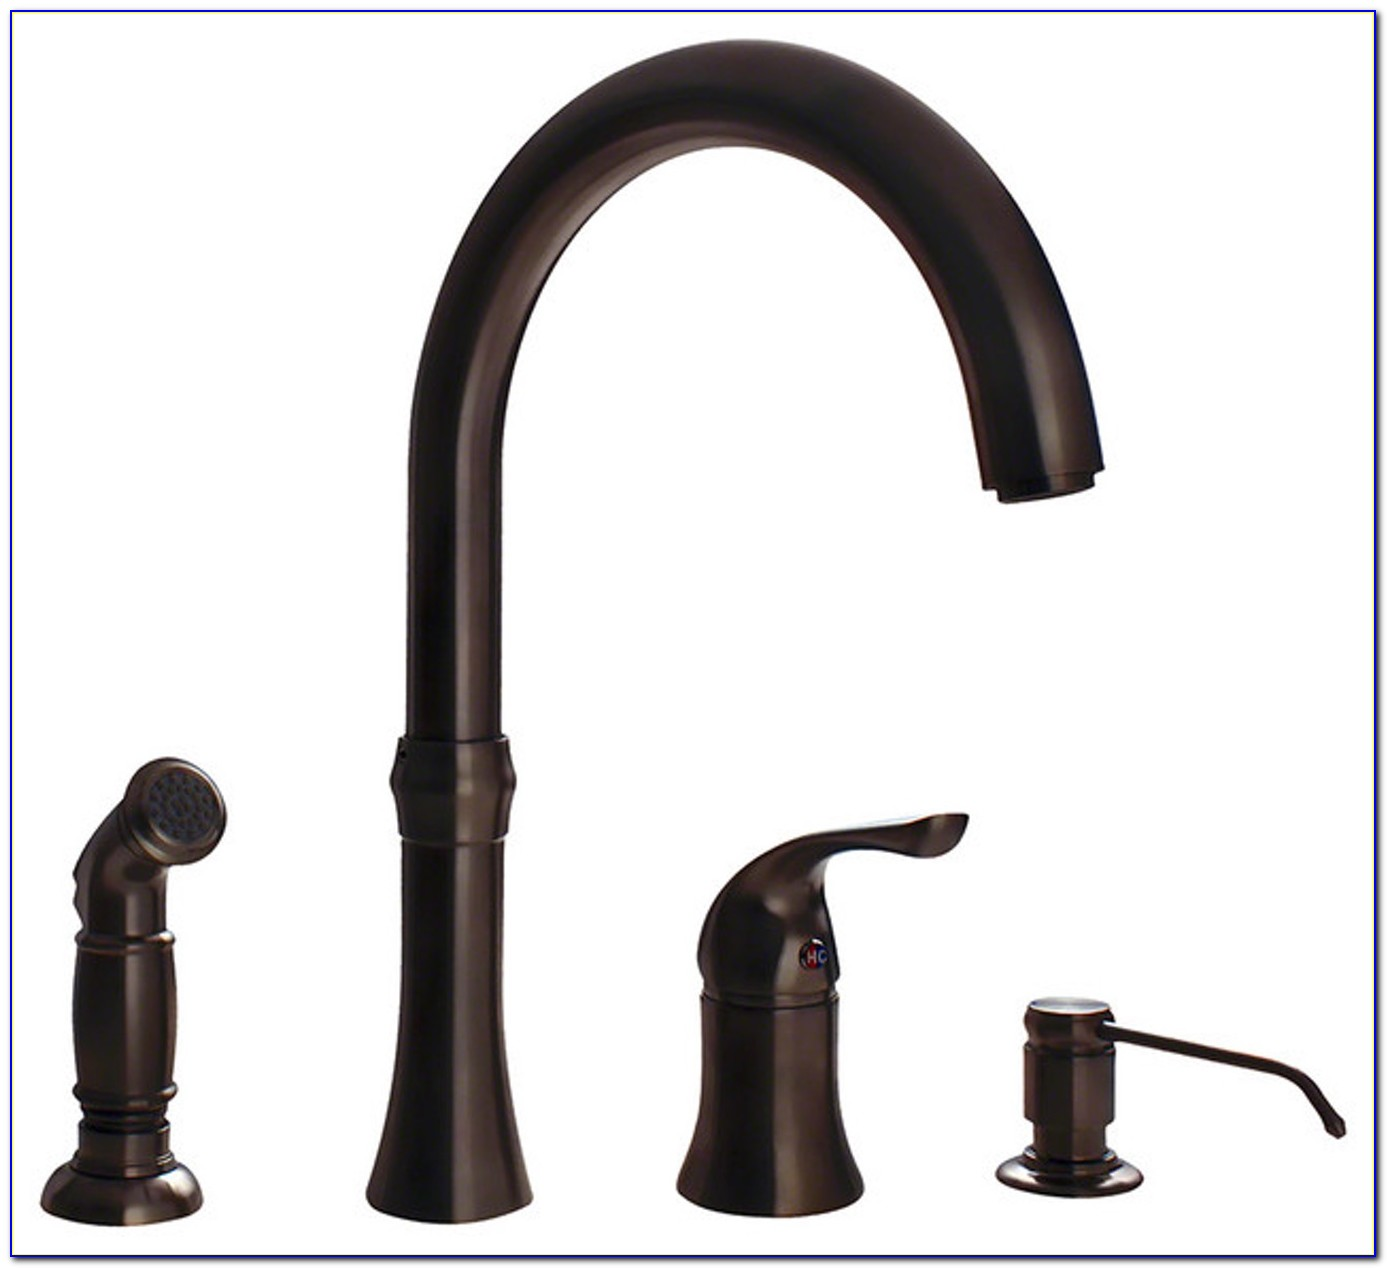 Delta Oil Rubbed Bronze Bath Faucets